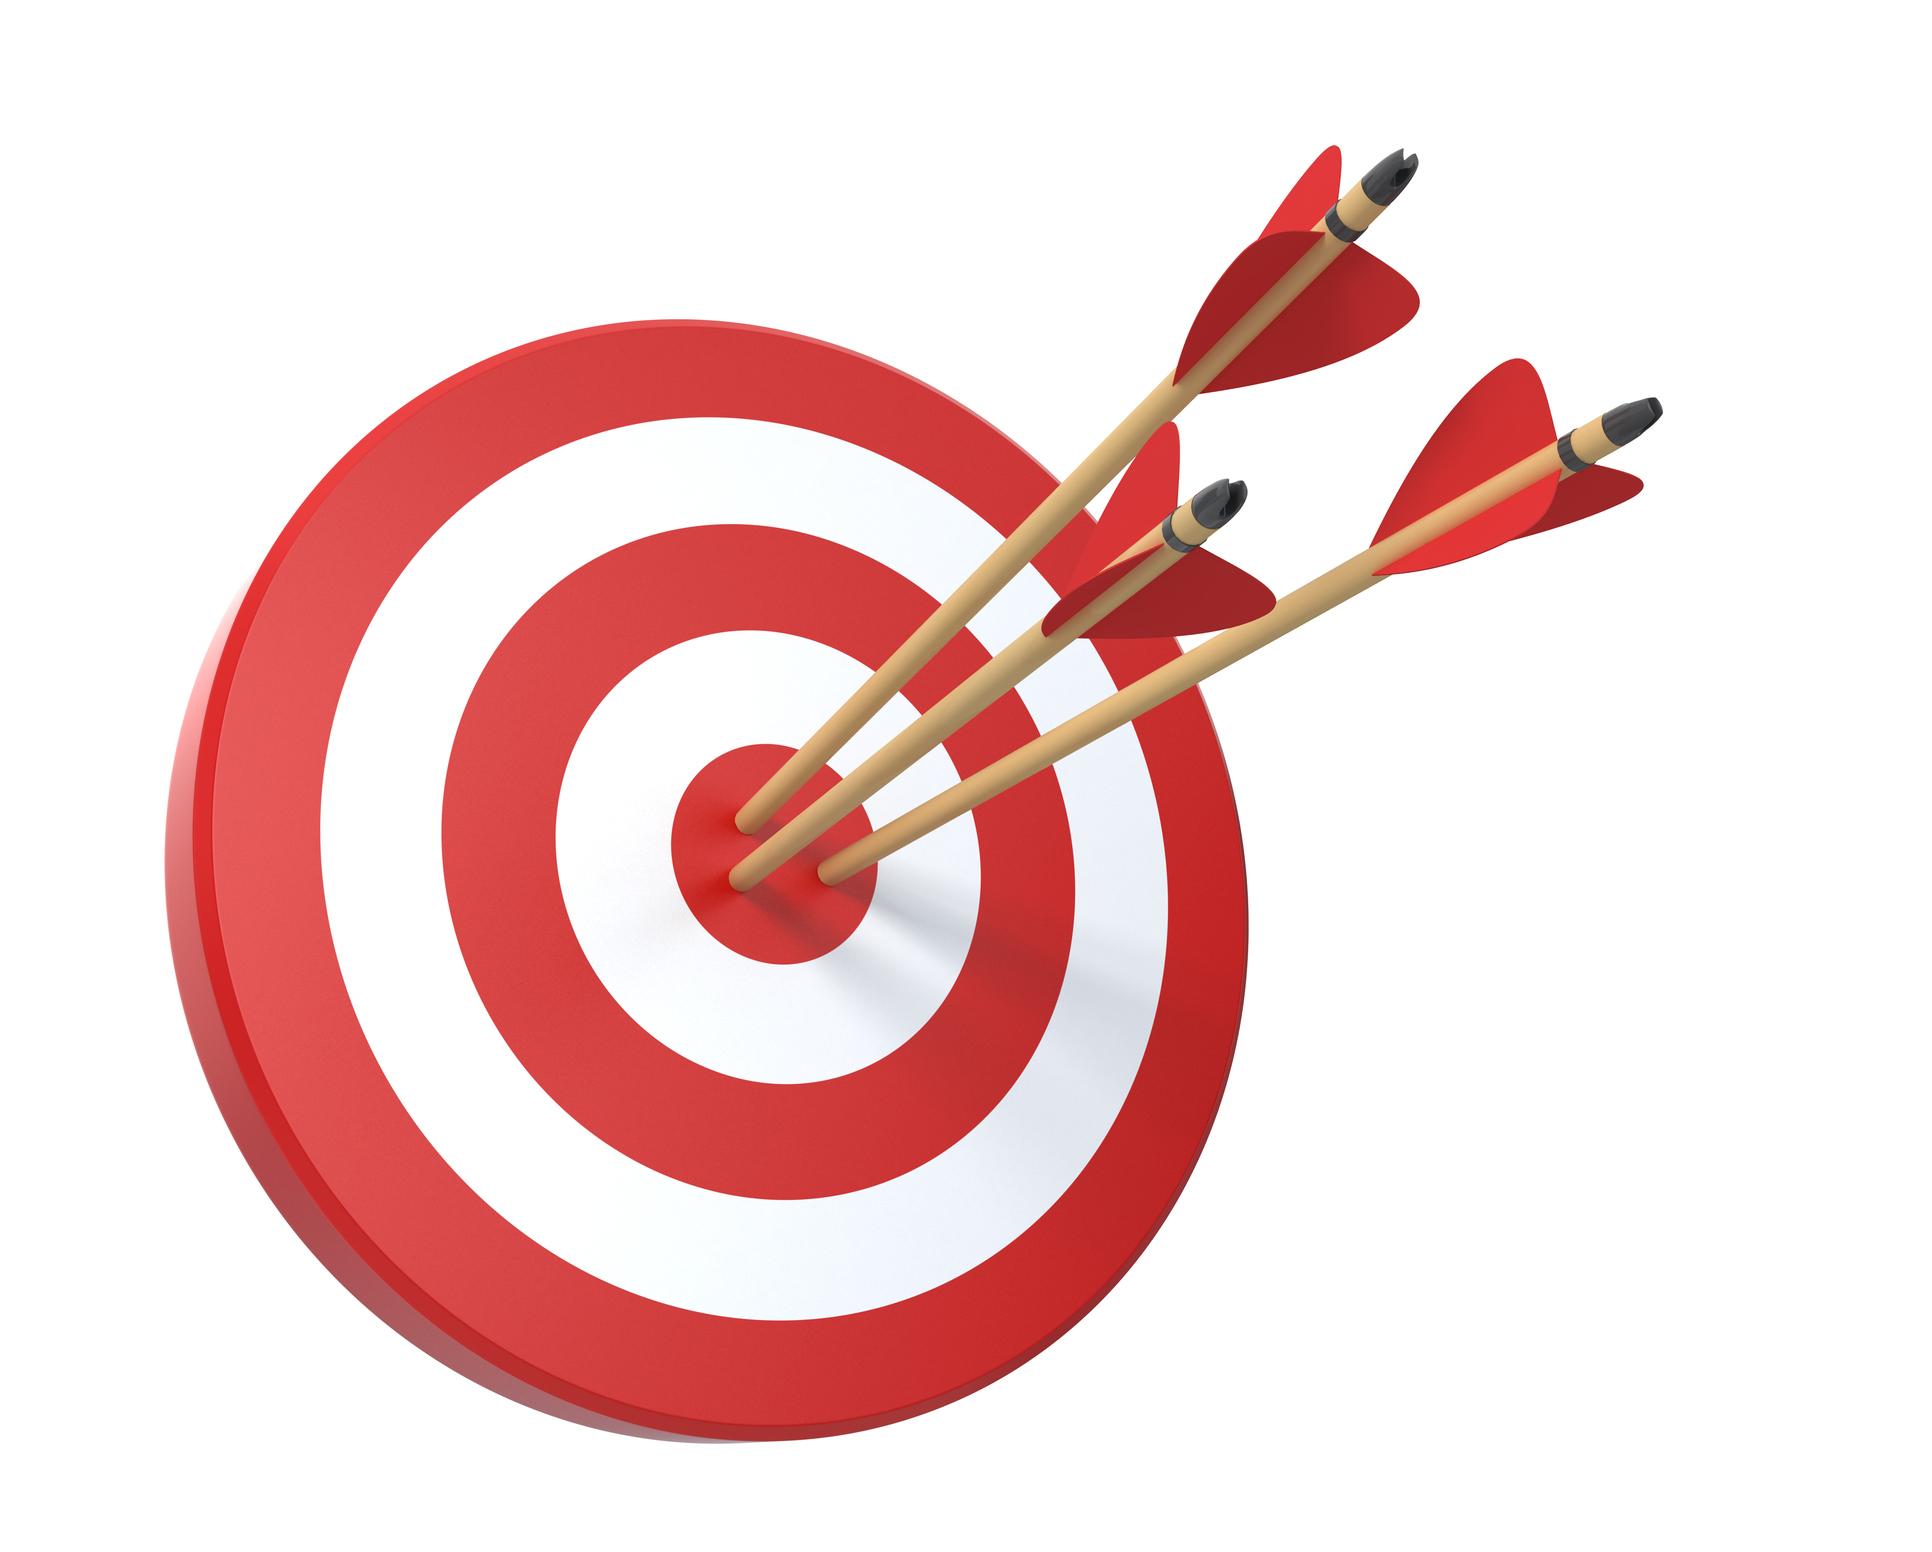 Bullseye with three arrows